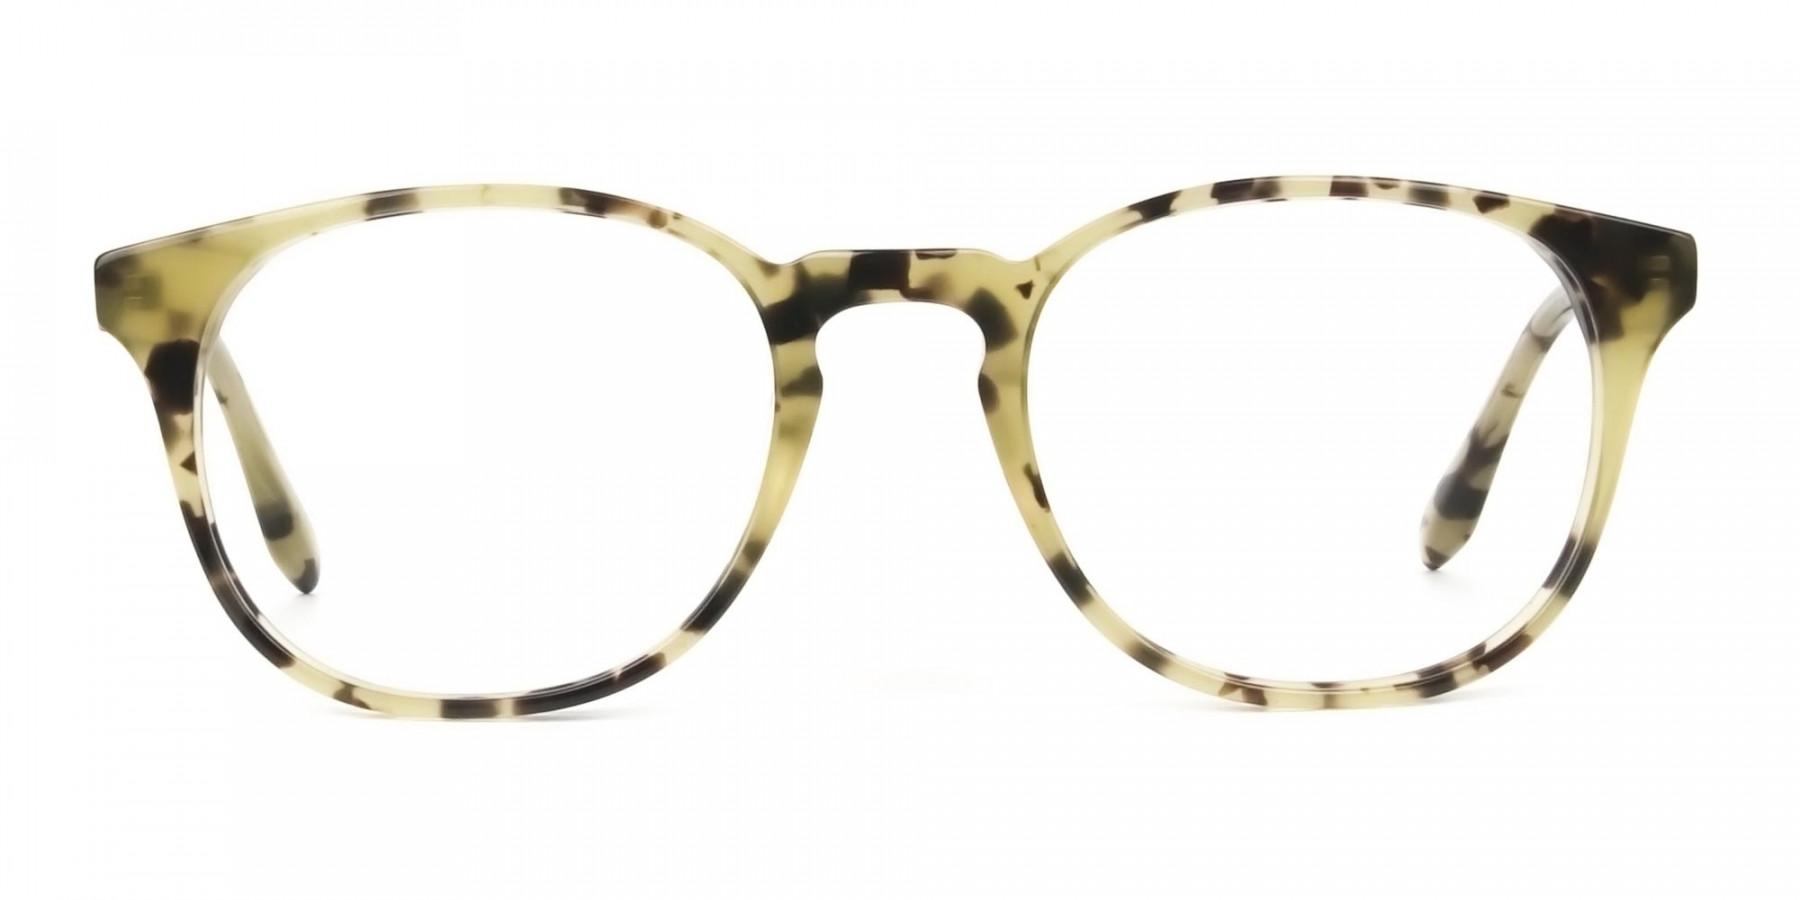 Keyhole Marzipan Tortoise Eyeglasses in Wayfarer - 1